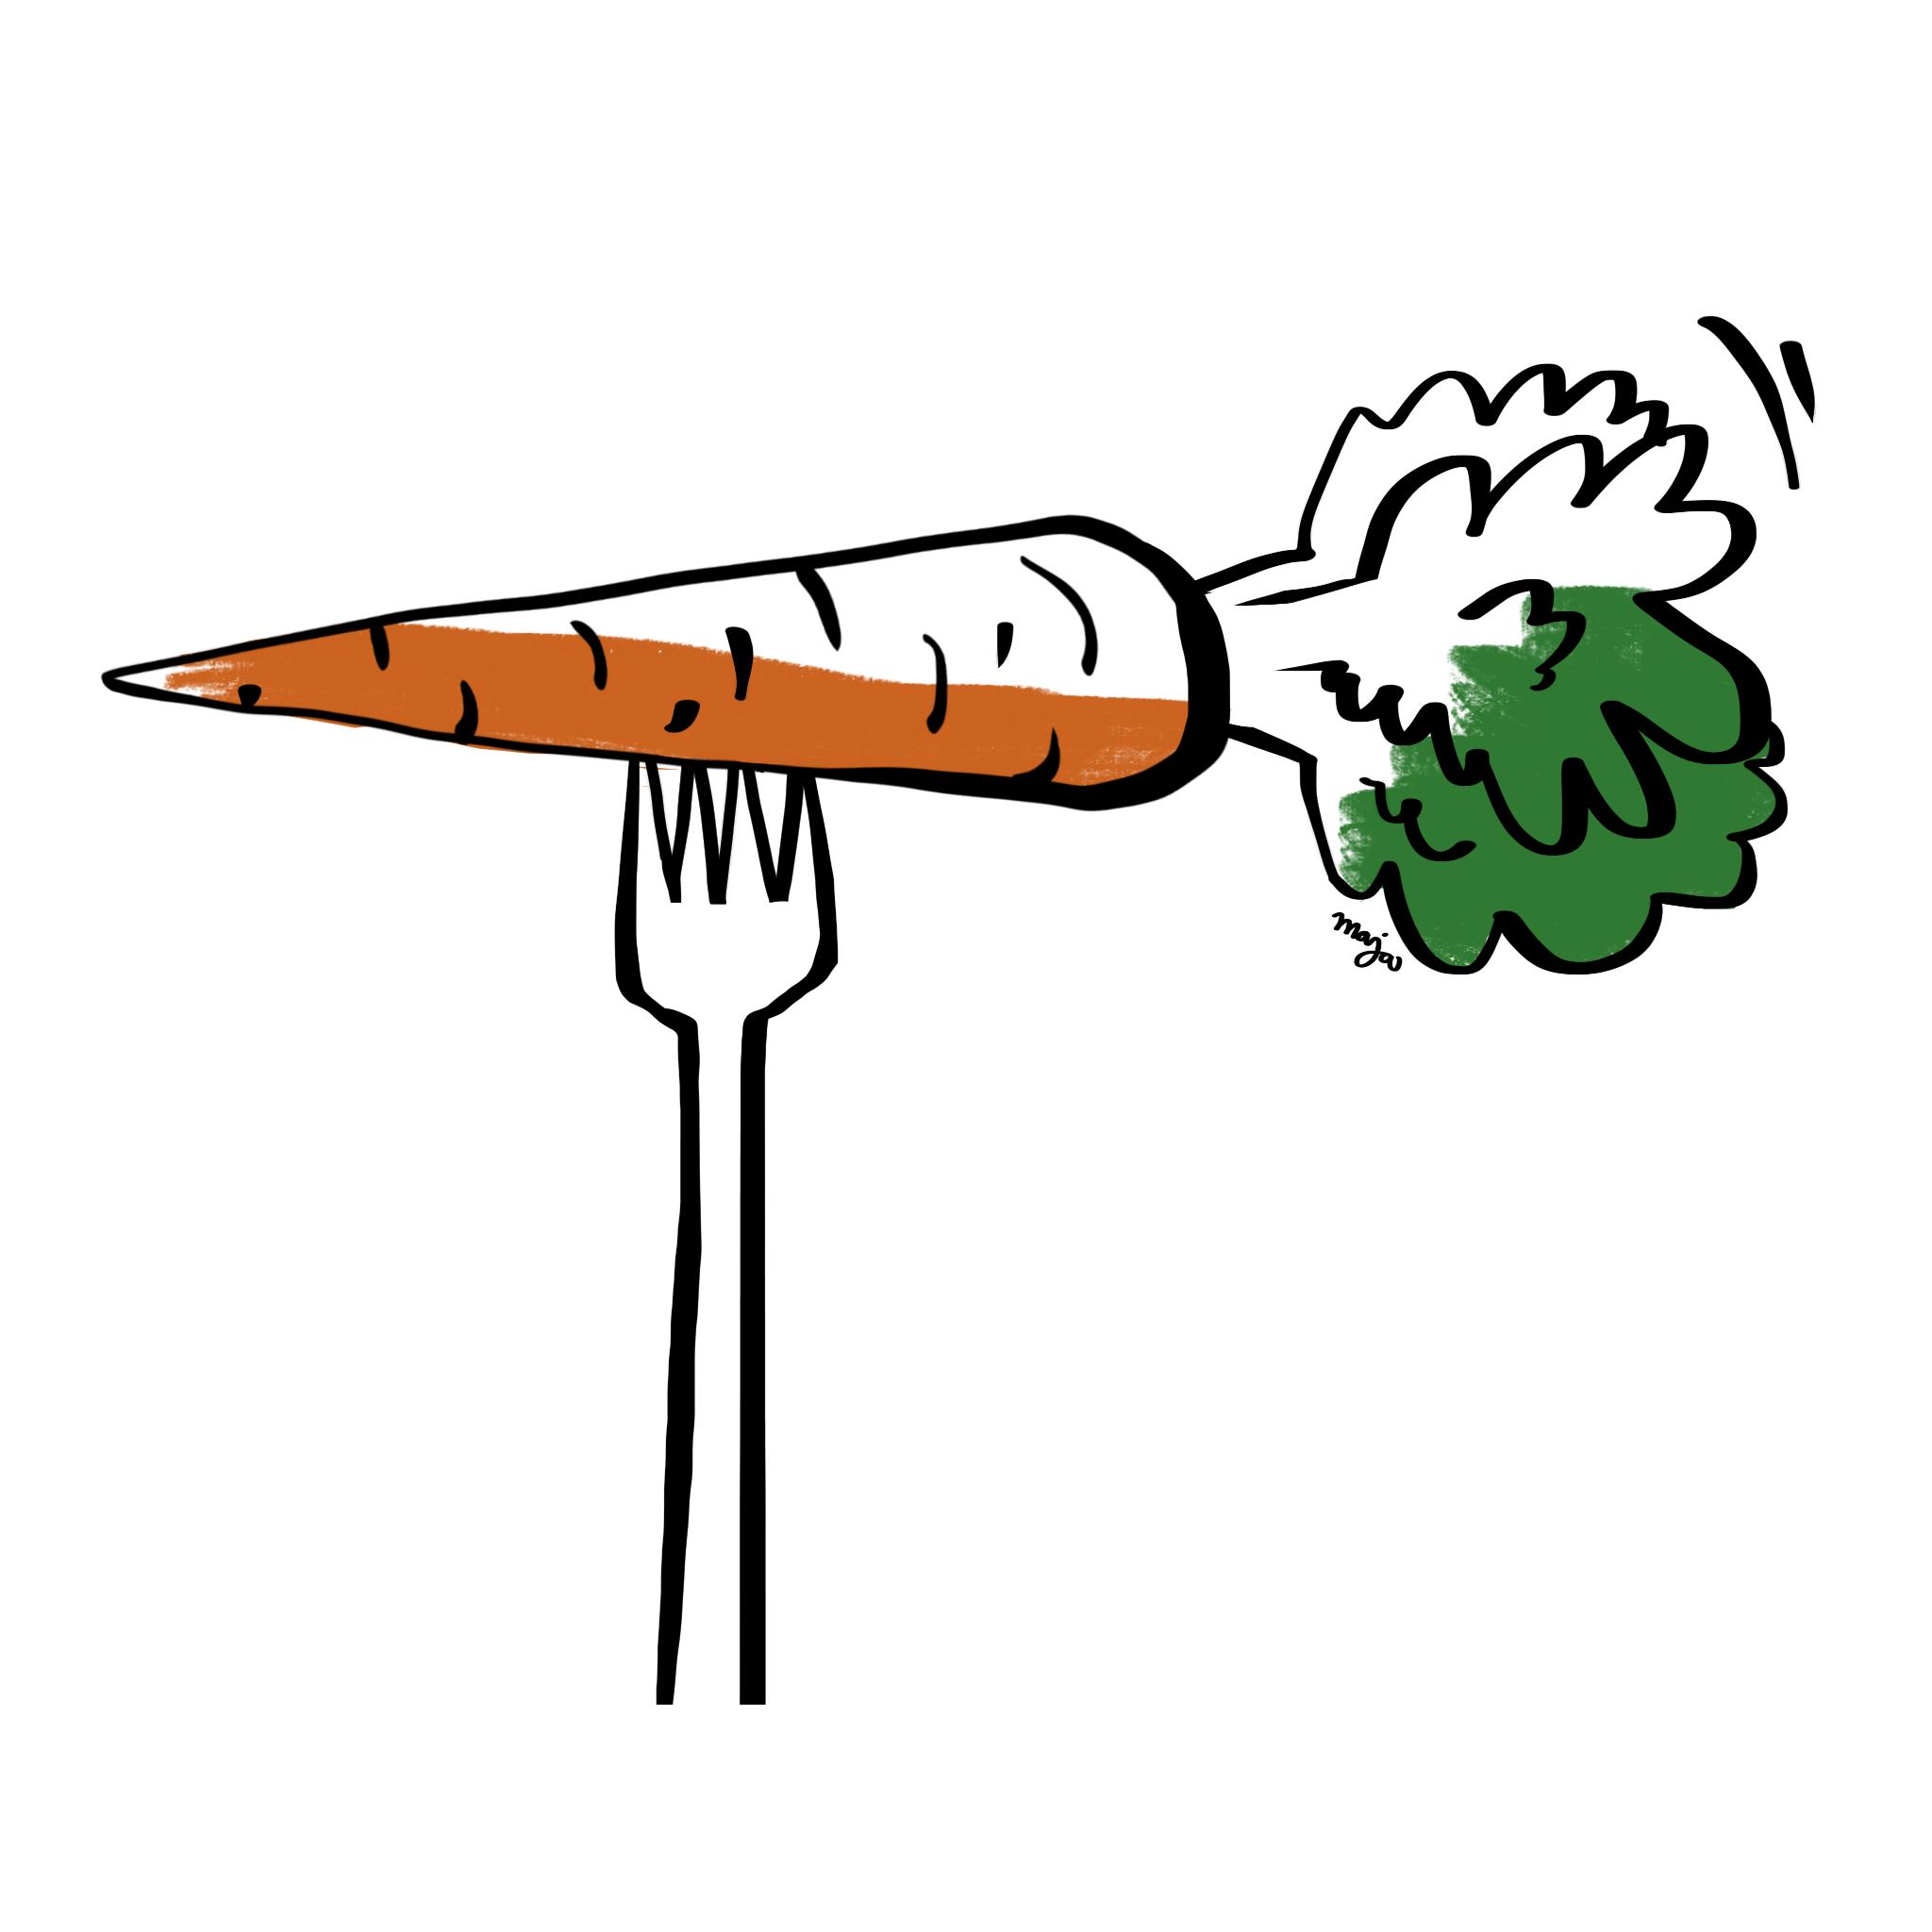 Morot-fasta- pasandberg-zonterapeut-illustration-majalarsson